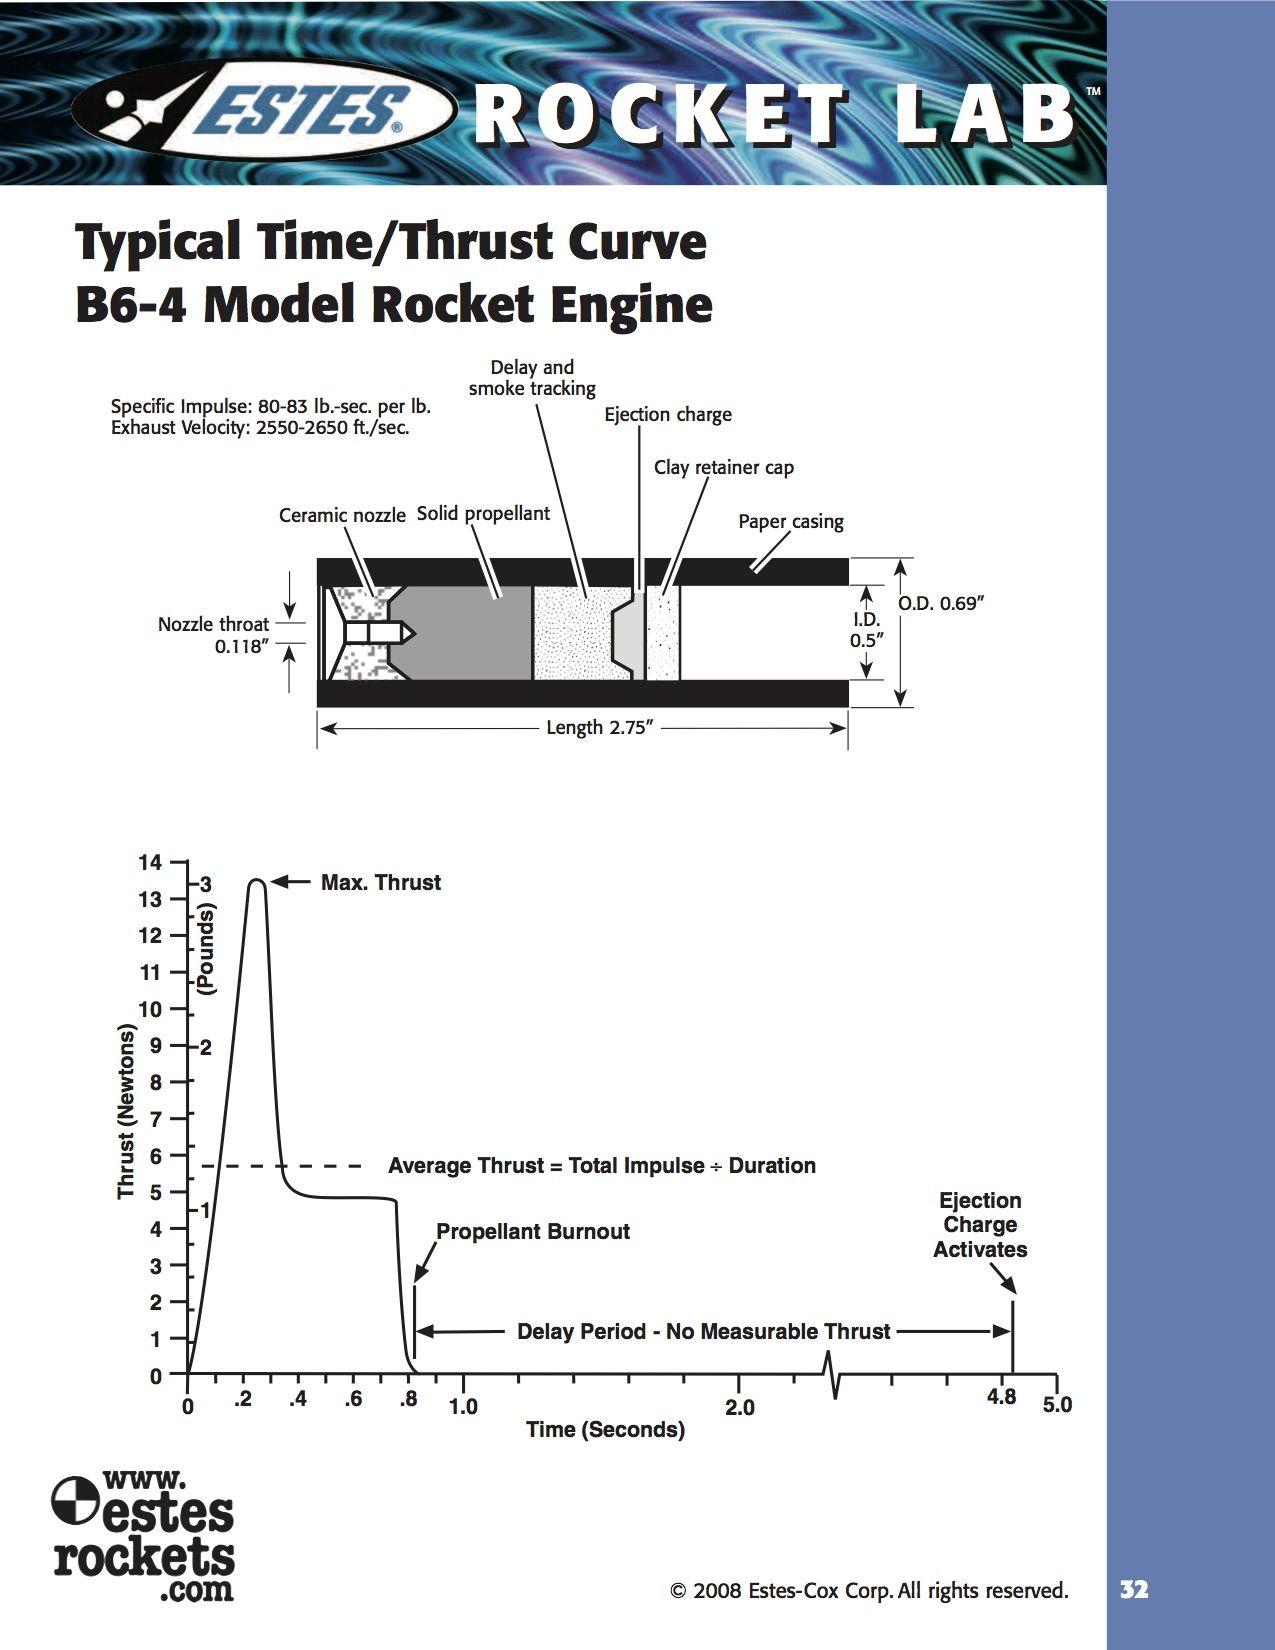 medium resolution of typical time thrust curve for a b6 4 model rocket engine specific impulse 80 83 lb sec per lb exhaust velocity 2550 2650 ft sec